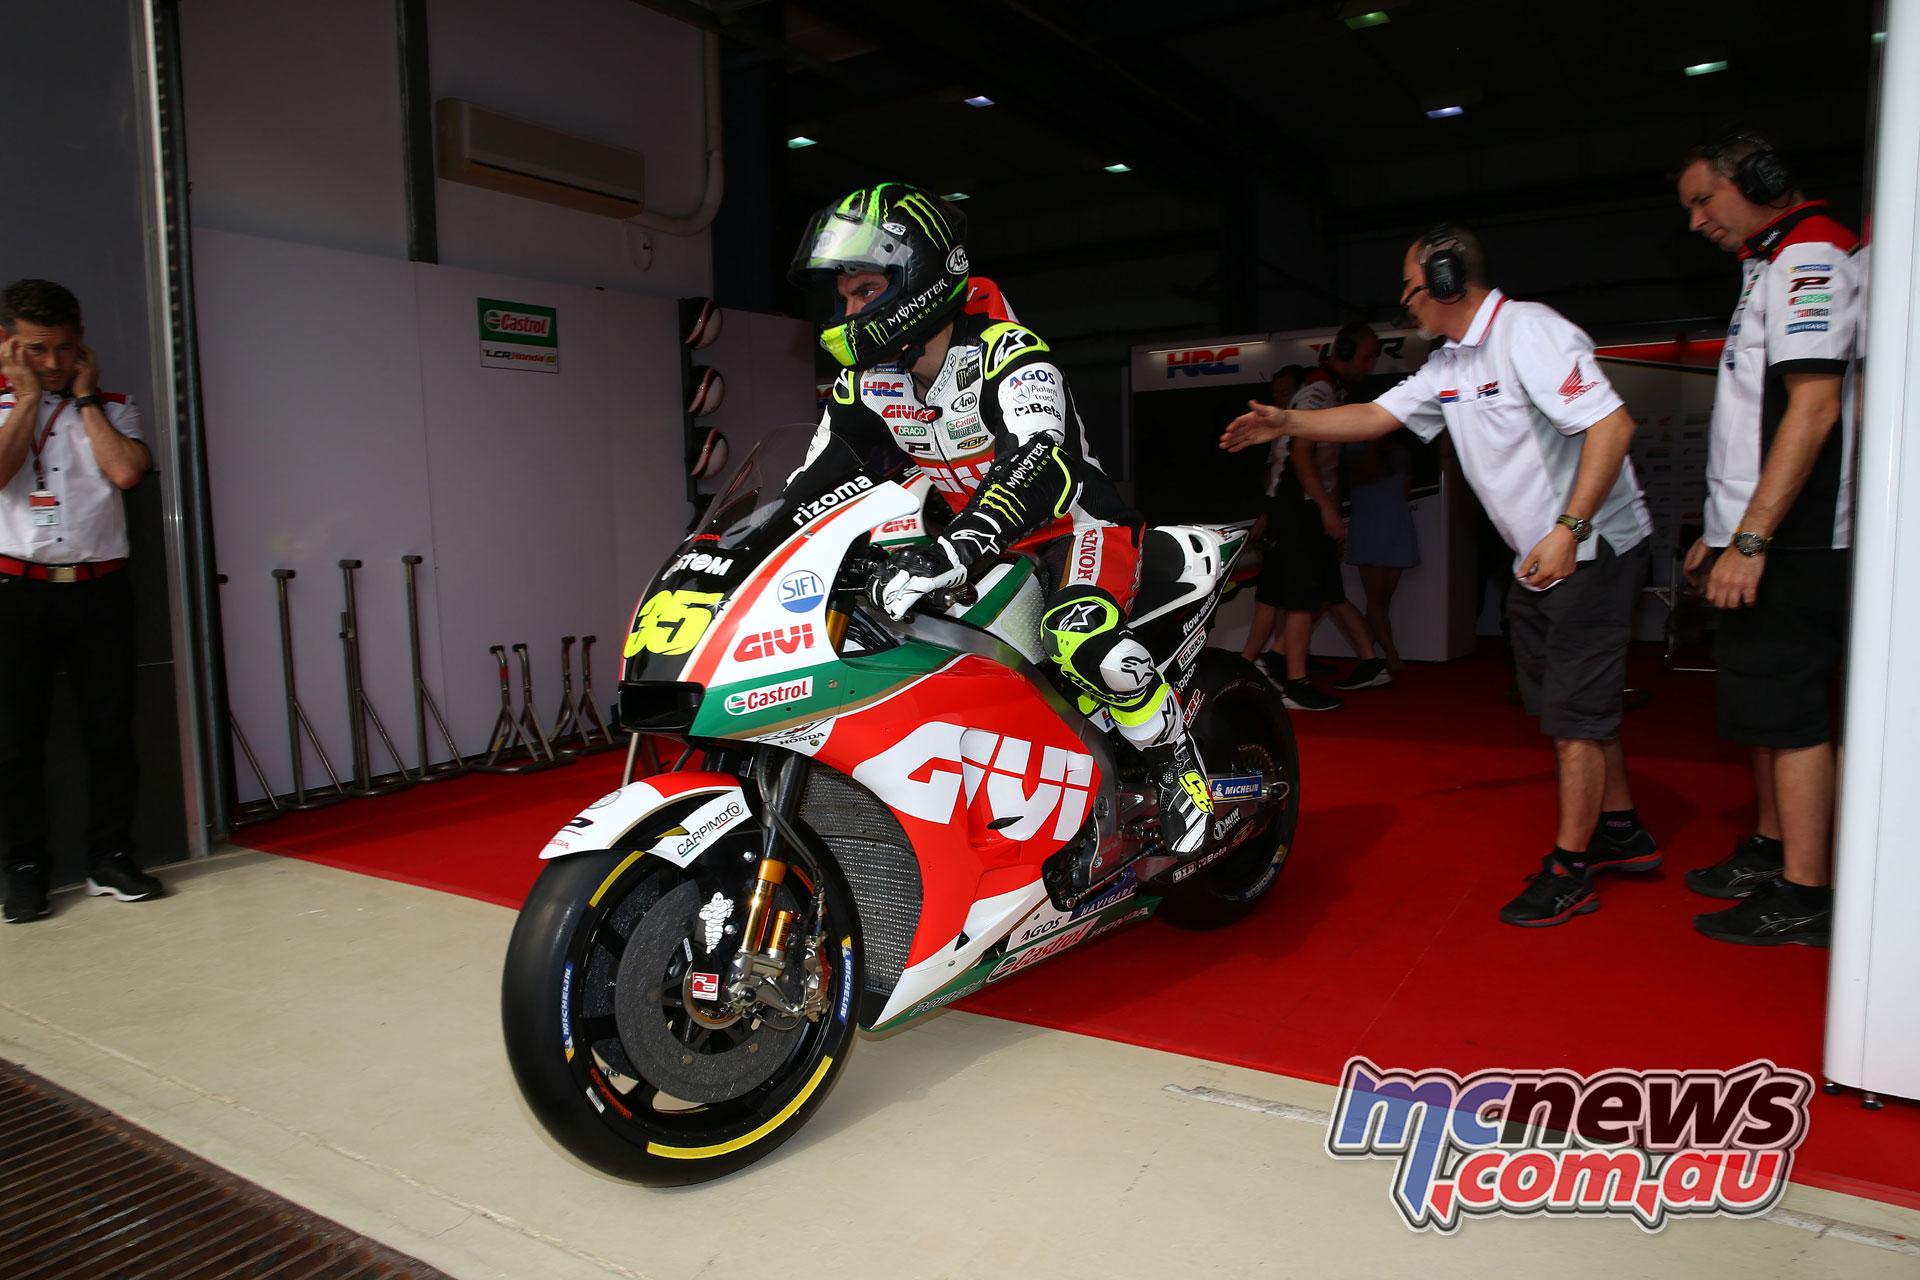 2018 Qatar MotoGP Images | Gallery C | MCNews.com.au